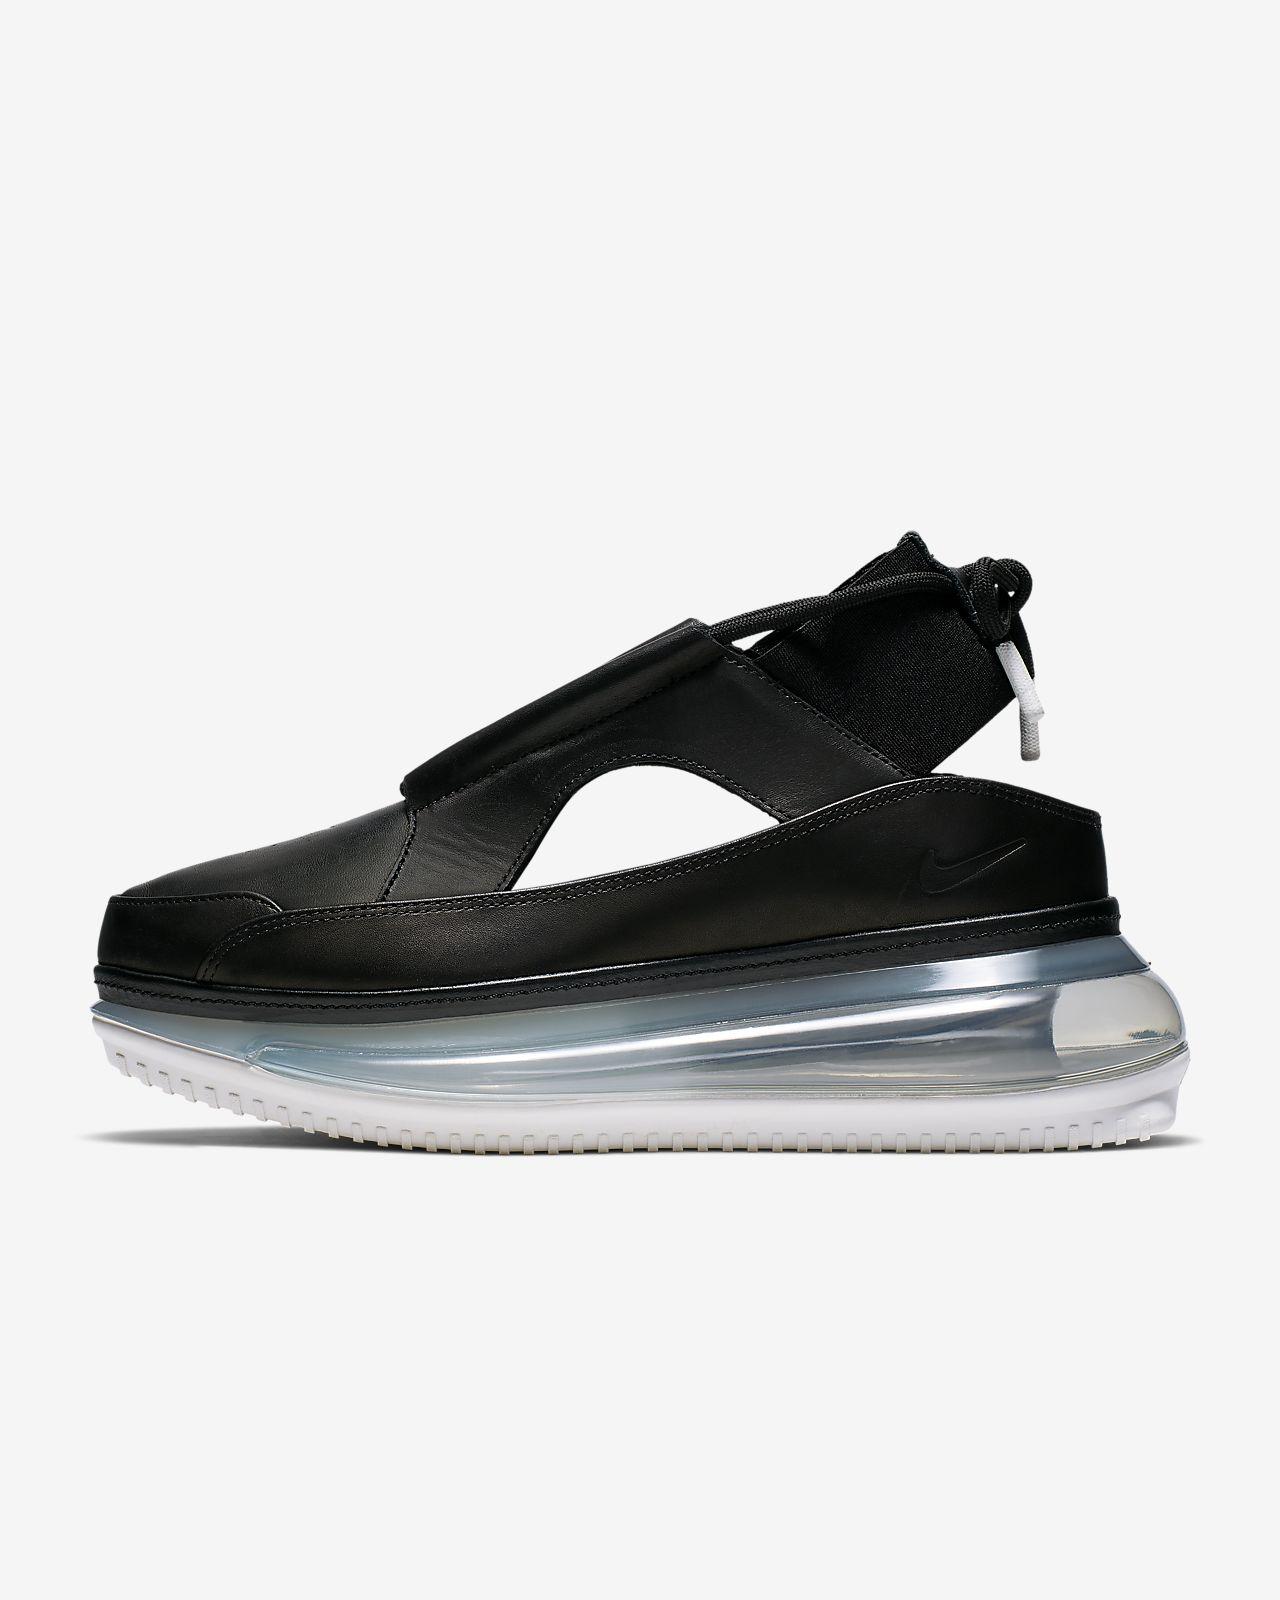 Buty damskie Nike Air Max FF 720